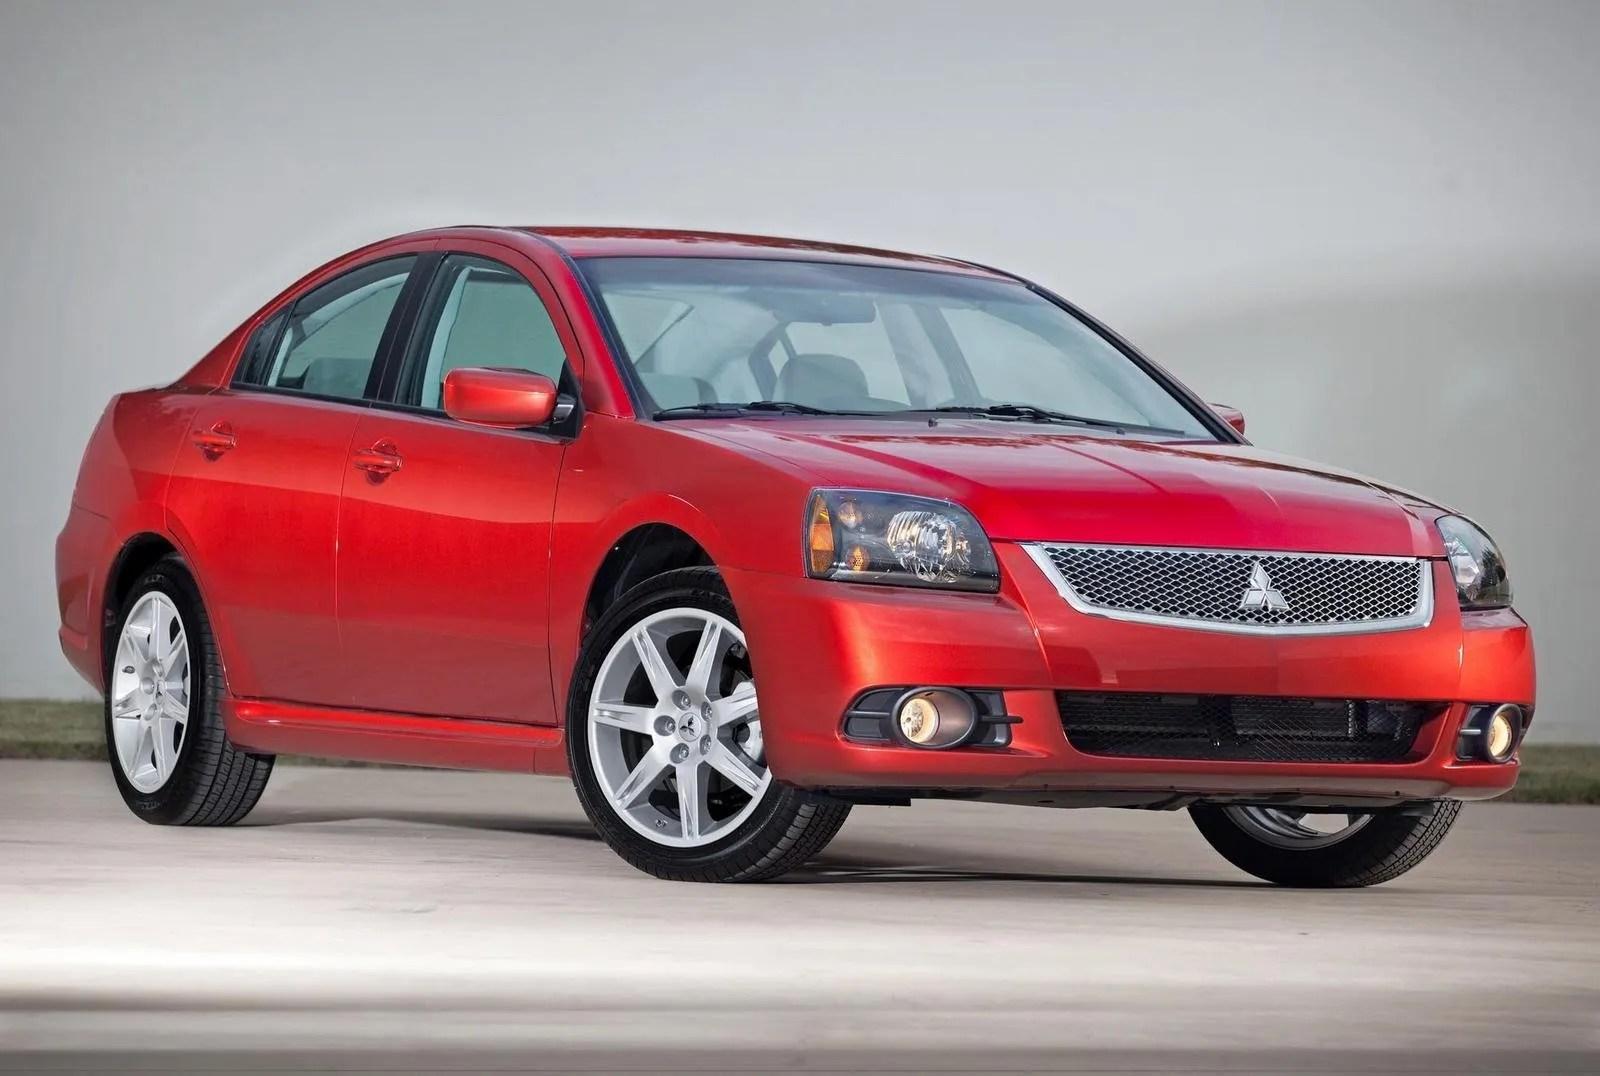 2010 Mitsubishi Galant Top Speed